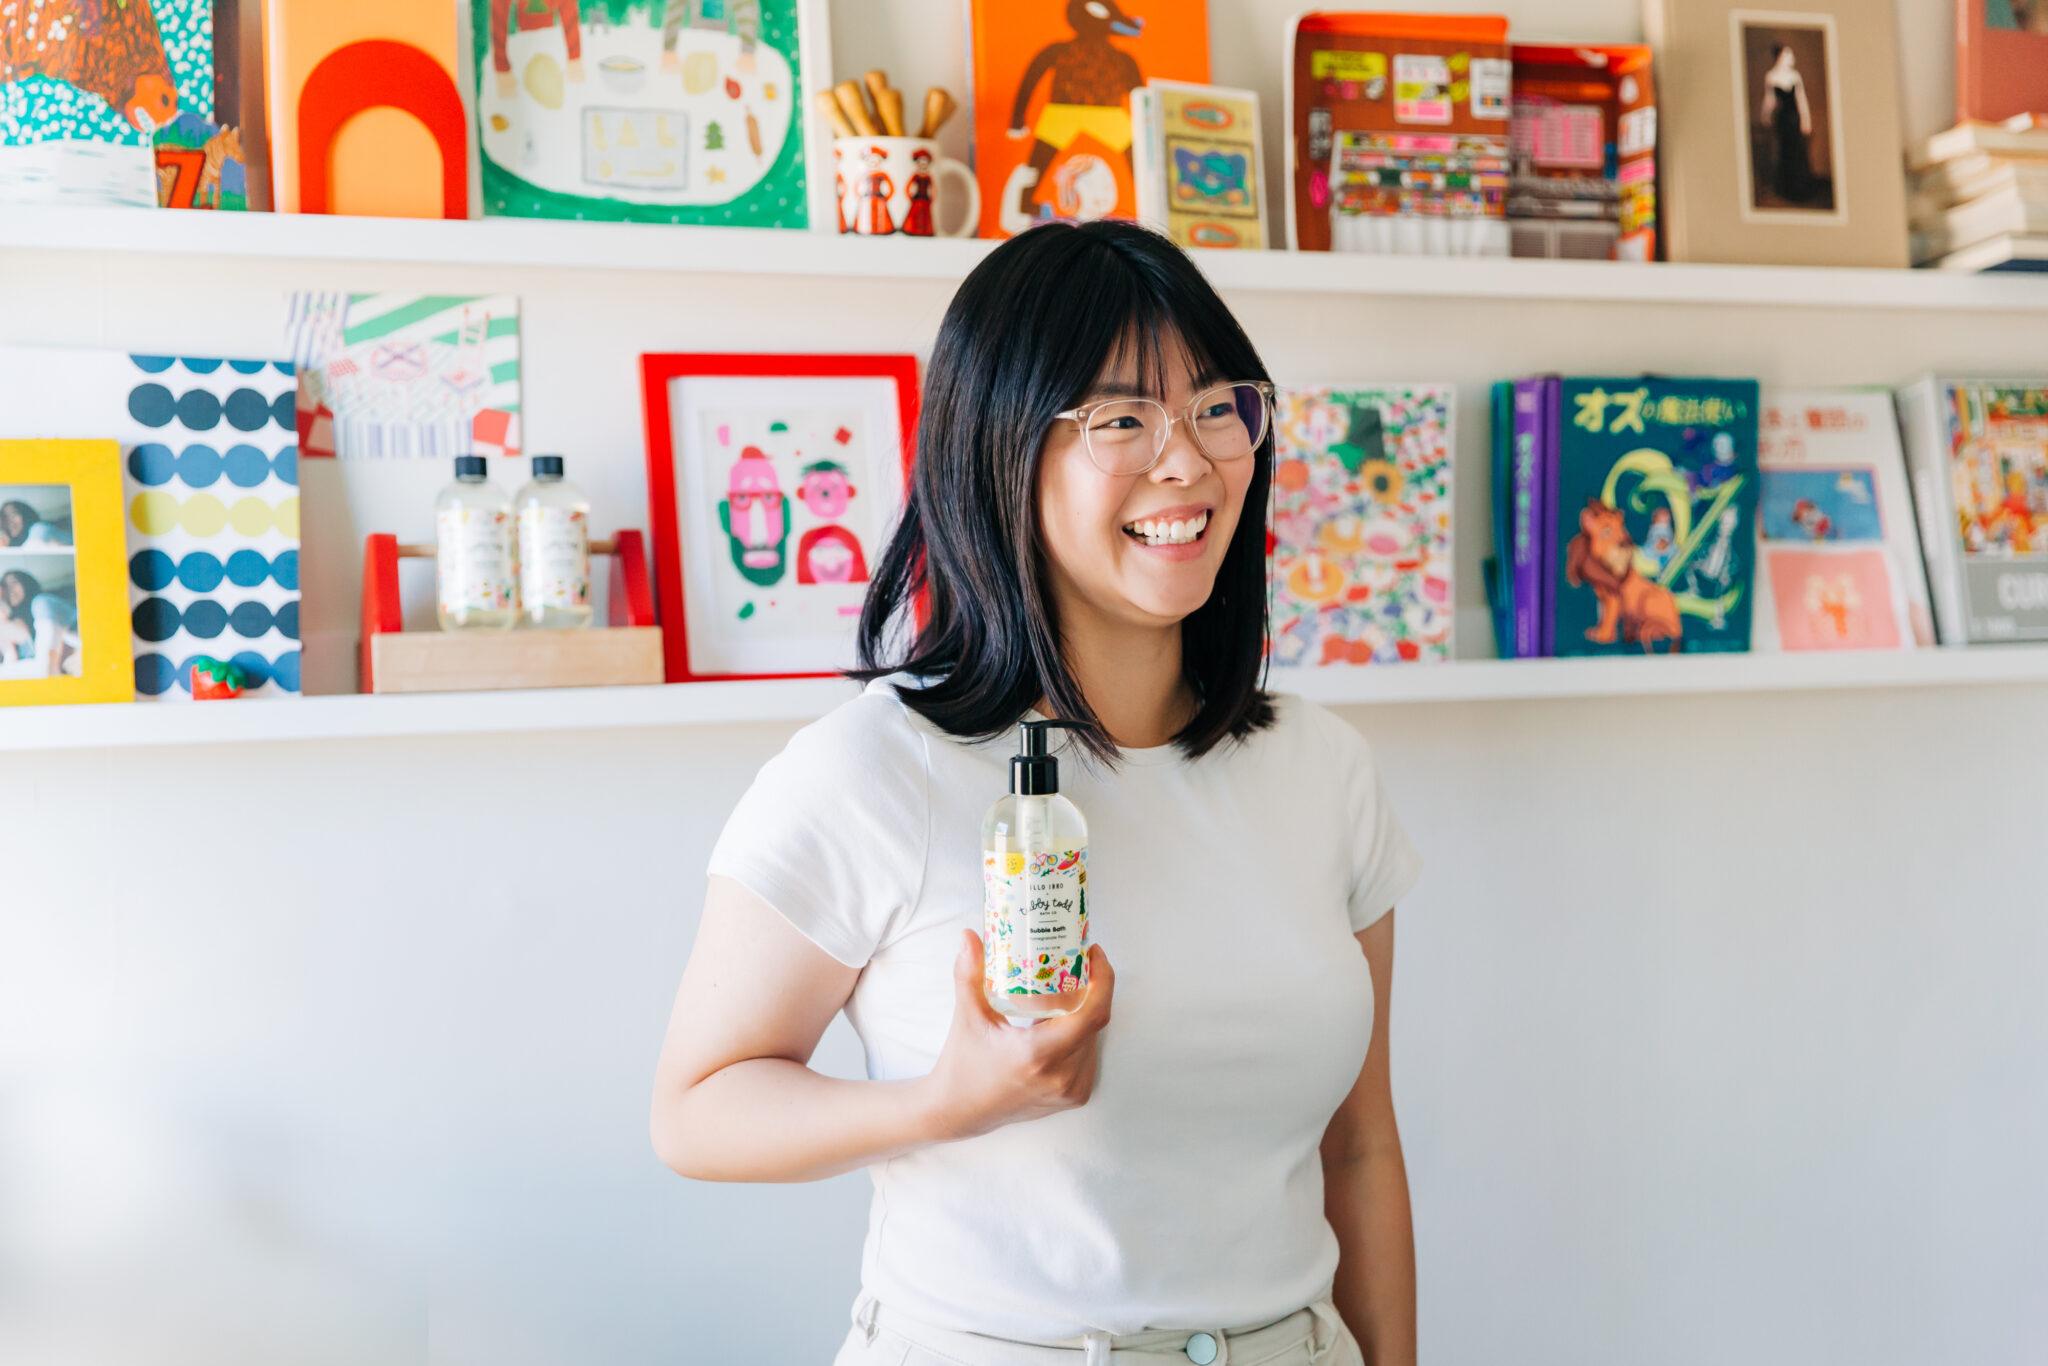 Asahi Nagata with her Tubby Todd Bubble Bath collaboration